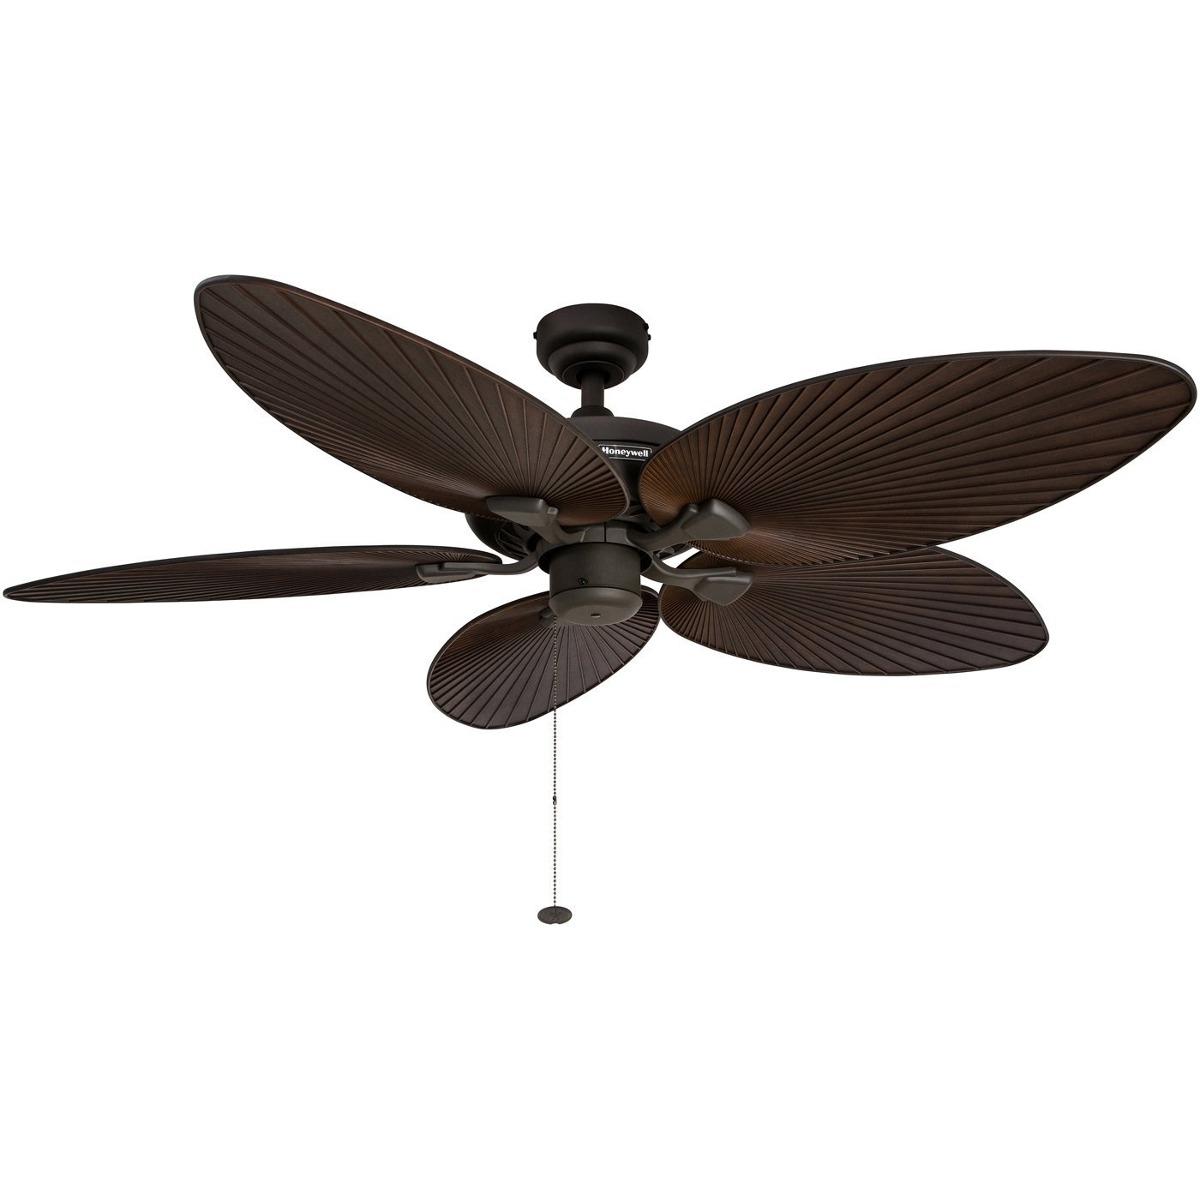 Honeywell palm island 52 inch tropical ceiling fan five pal cargando zoom aloadofball Images